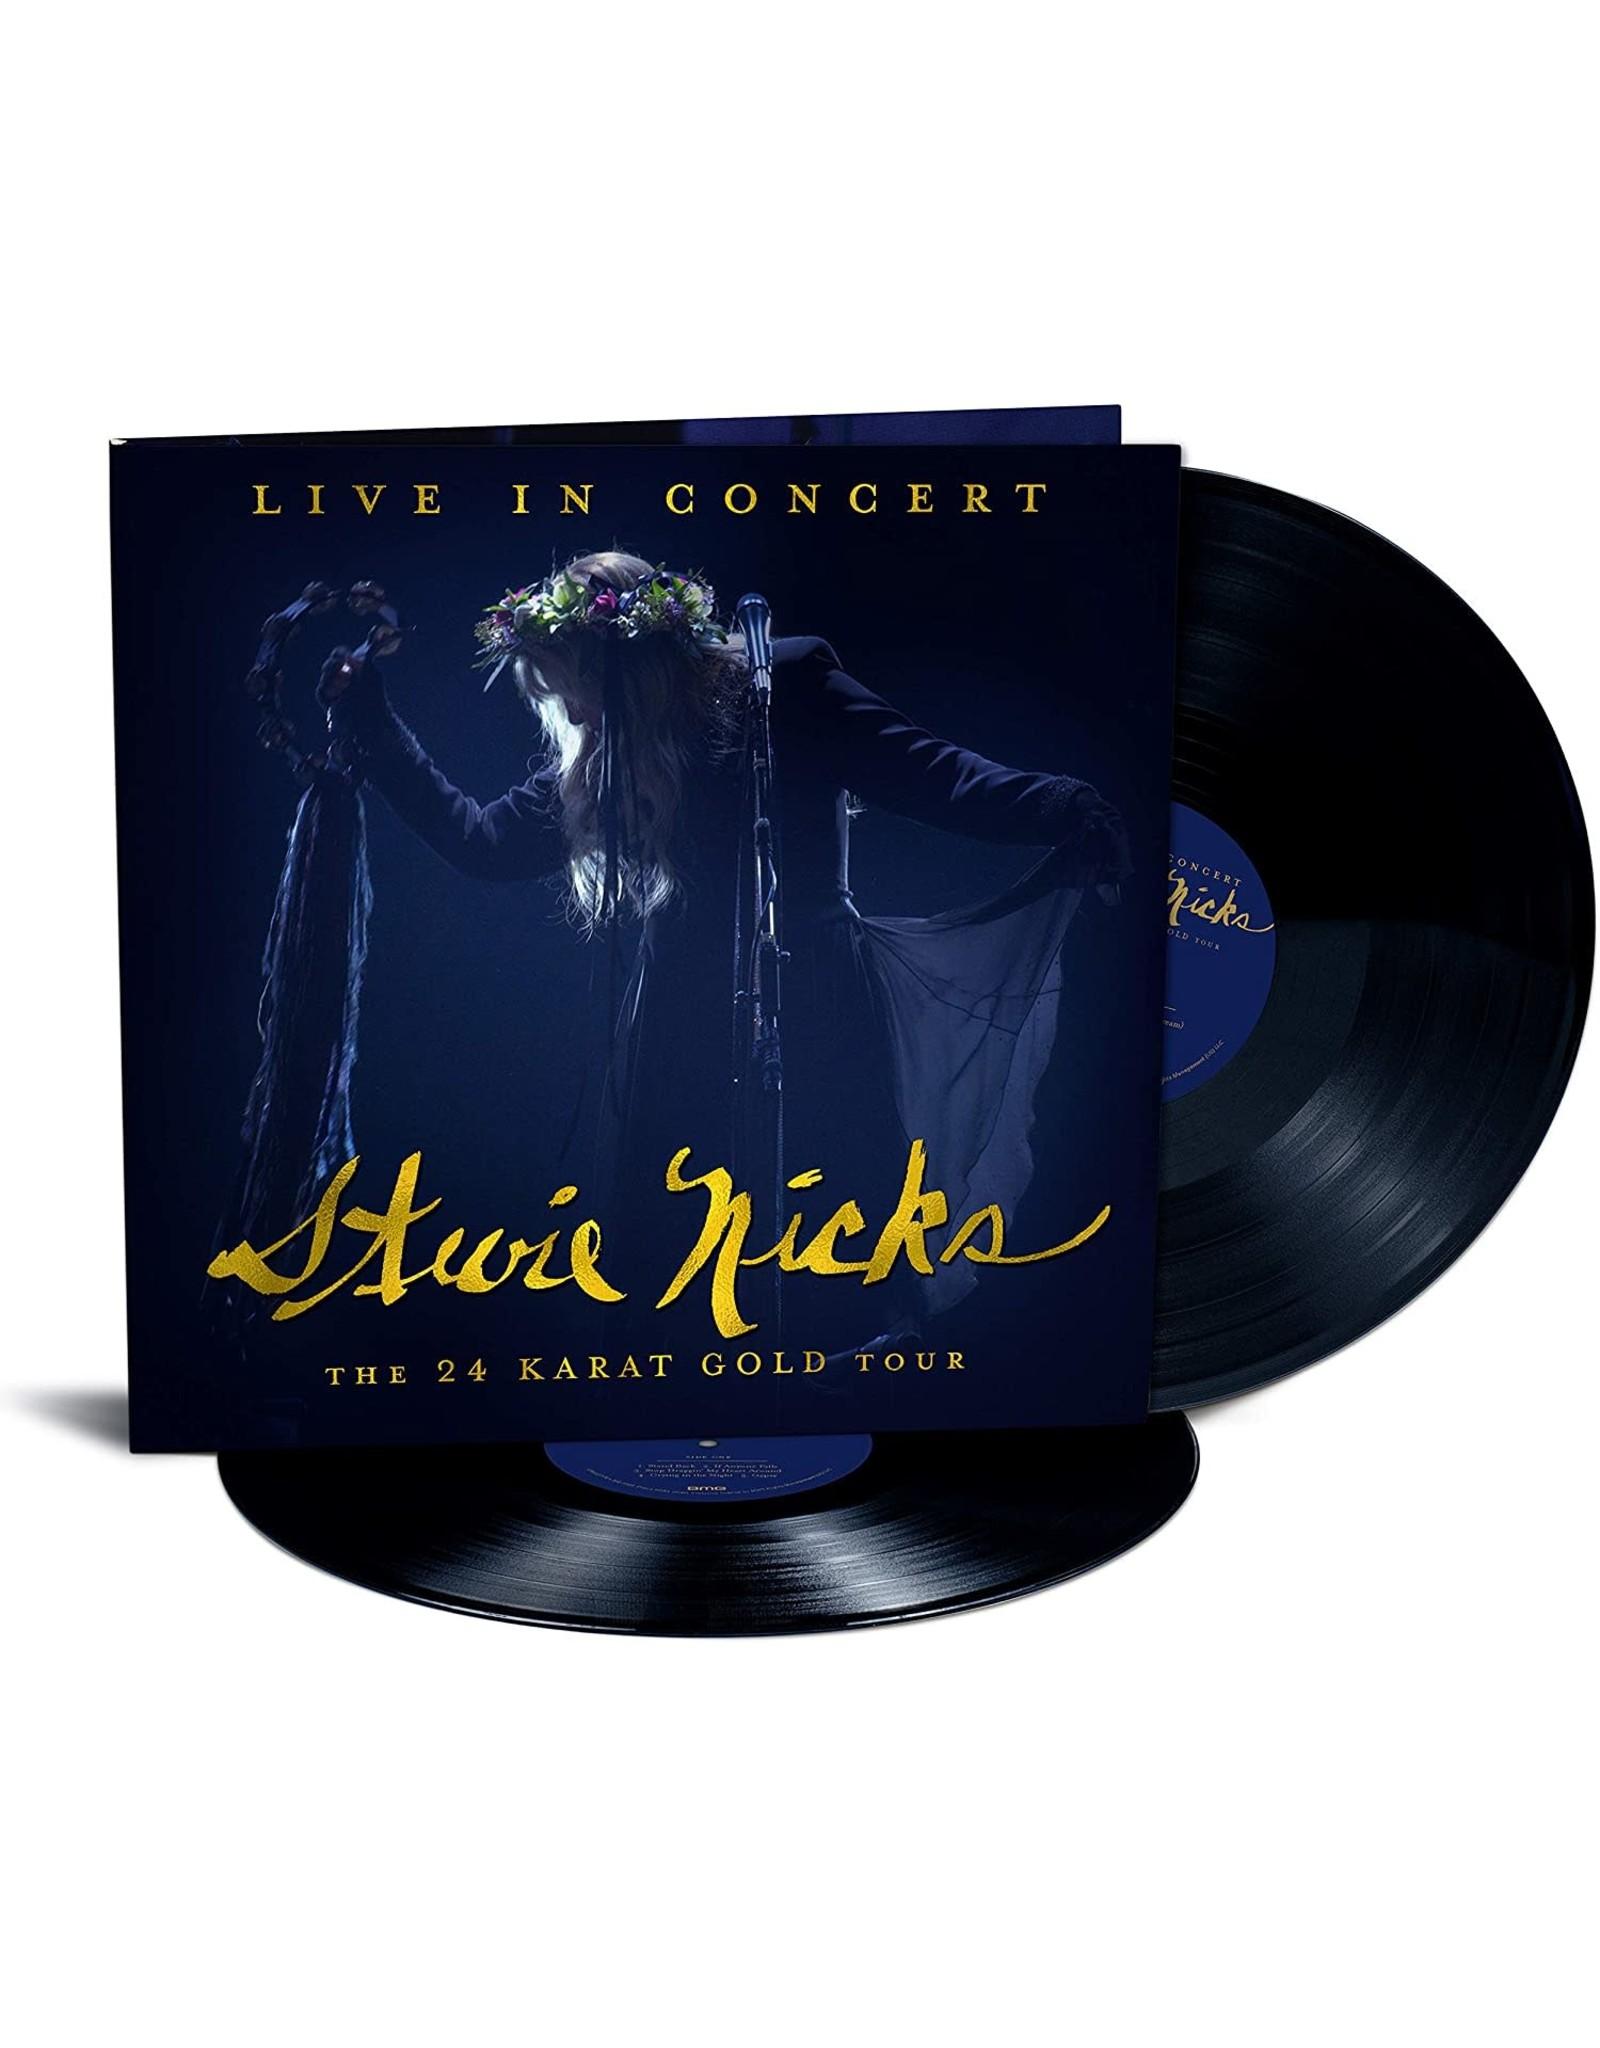 Stevie Nicks - Live In Concert: The 24 Karat Gold Tour